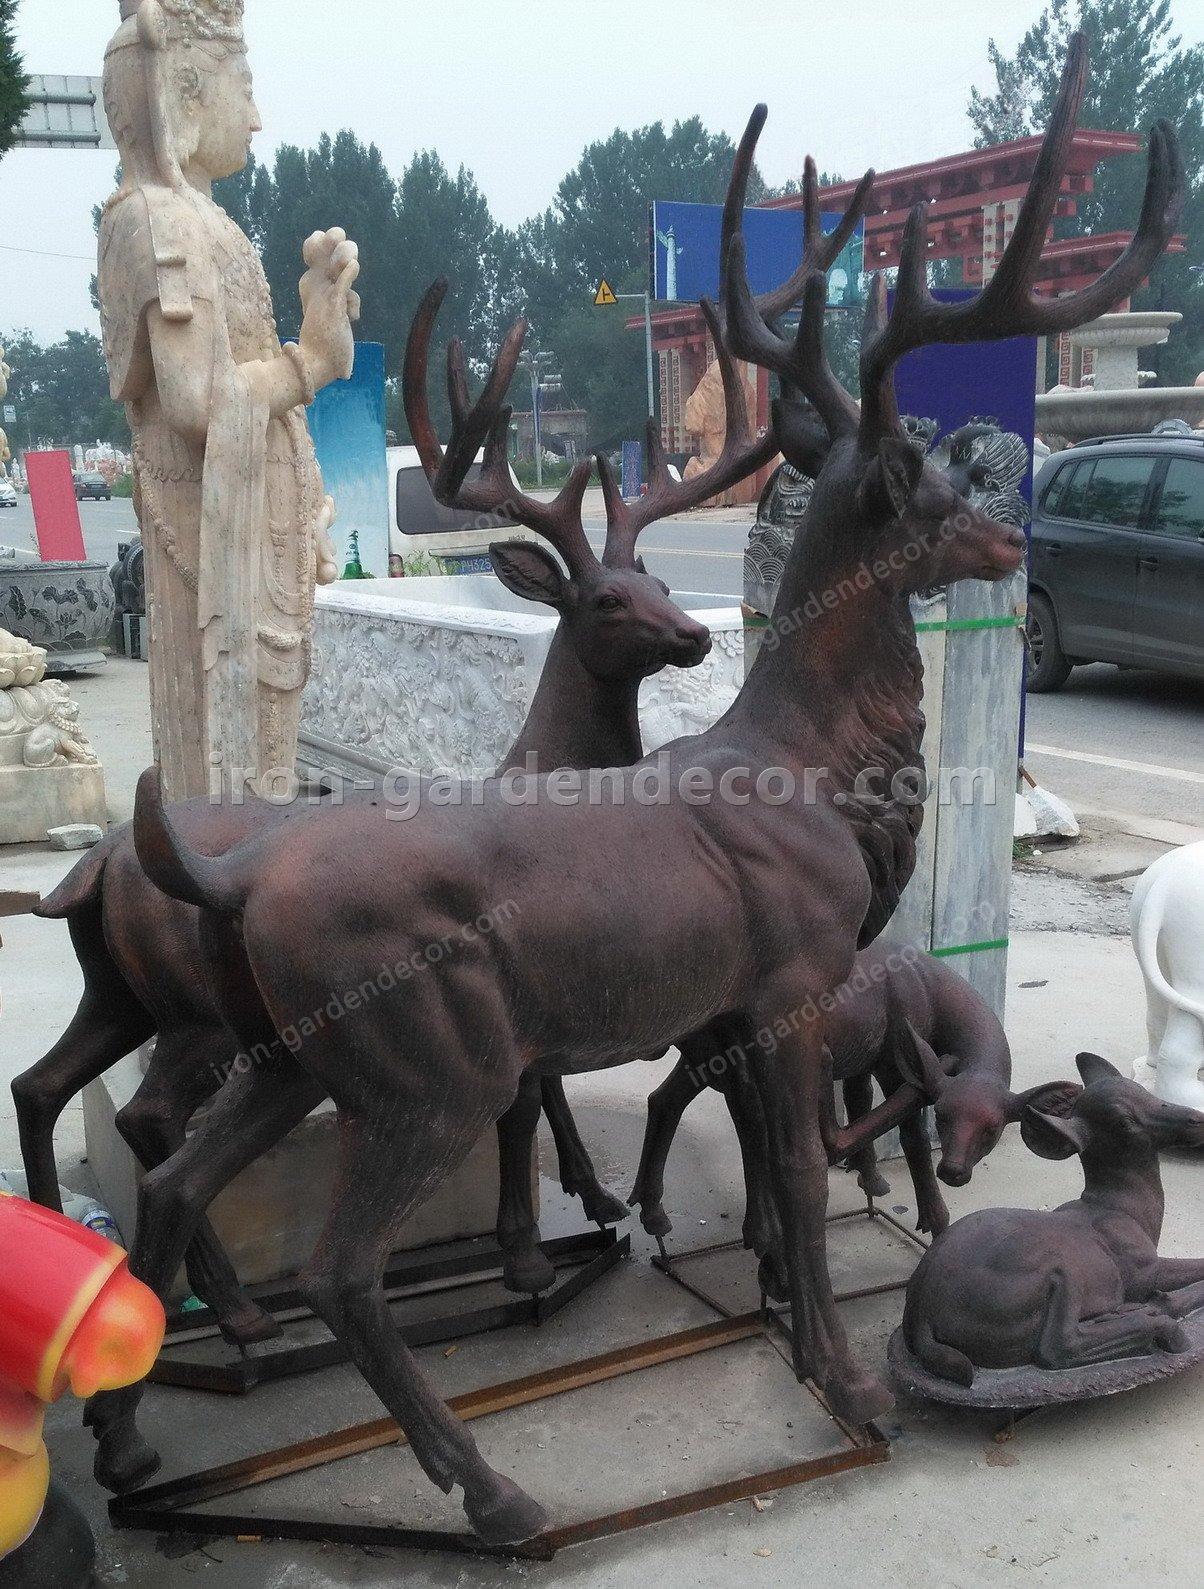 Home decoration outdoor garden stage animal resin statue fiberglass-DEER FAMILY FS076 (8)